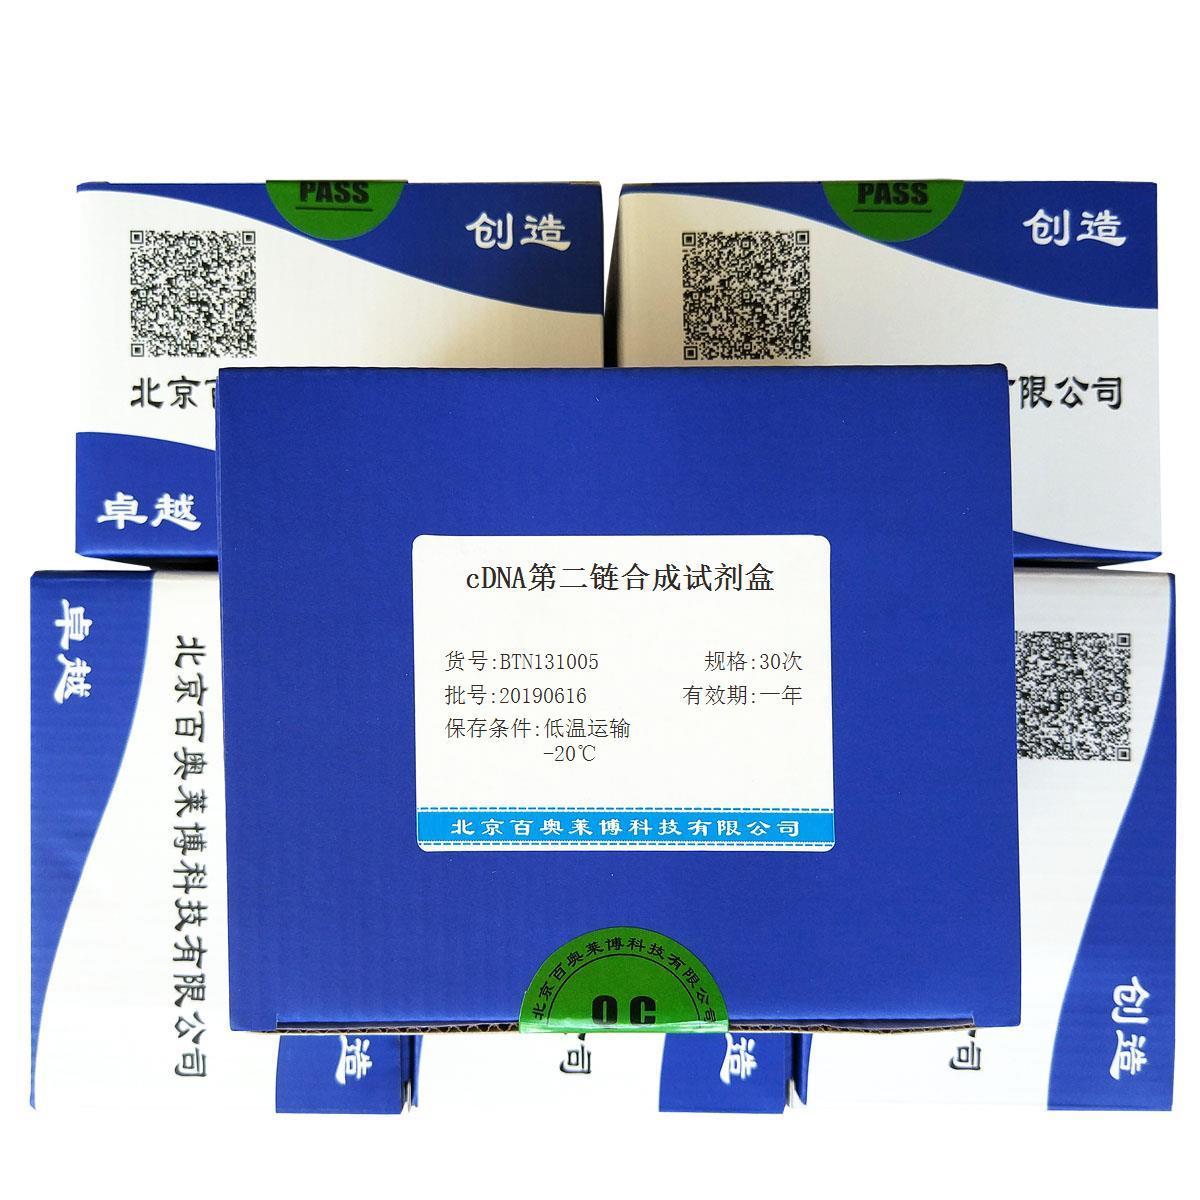 cDNA第二链合成试剂盒北京供应商